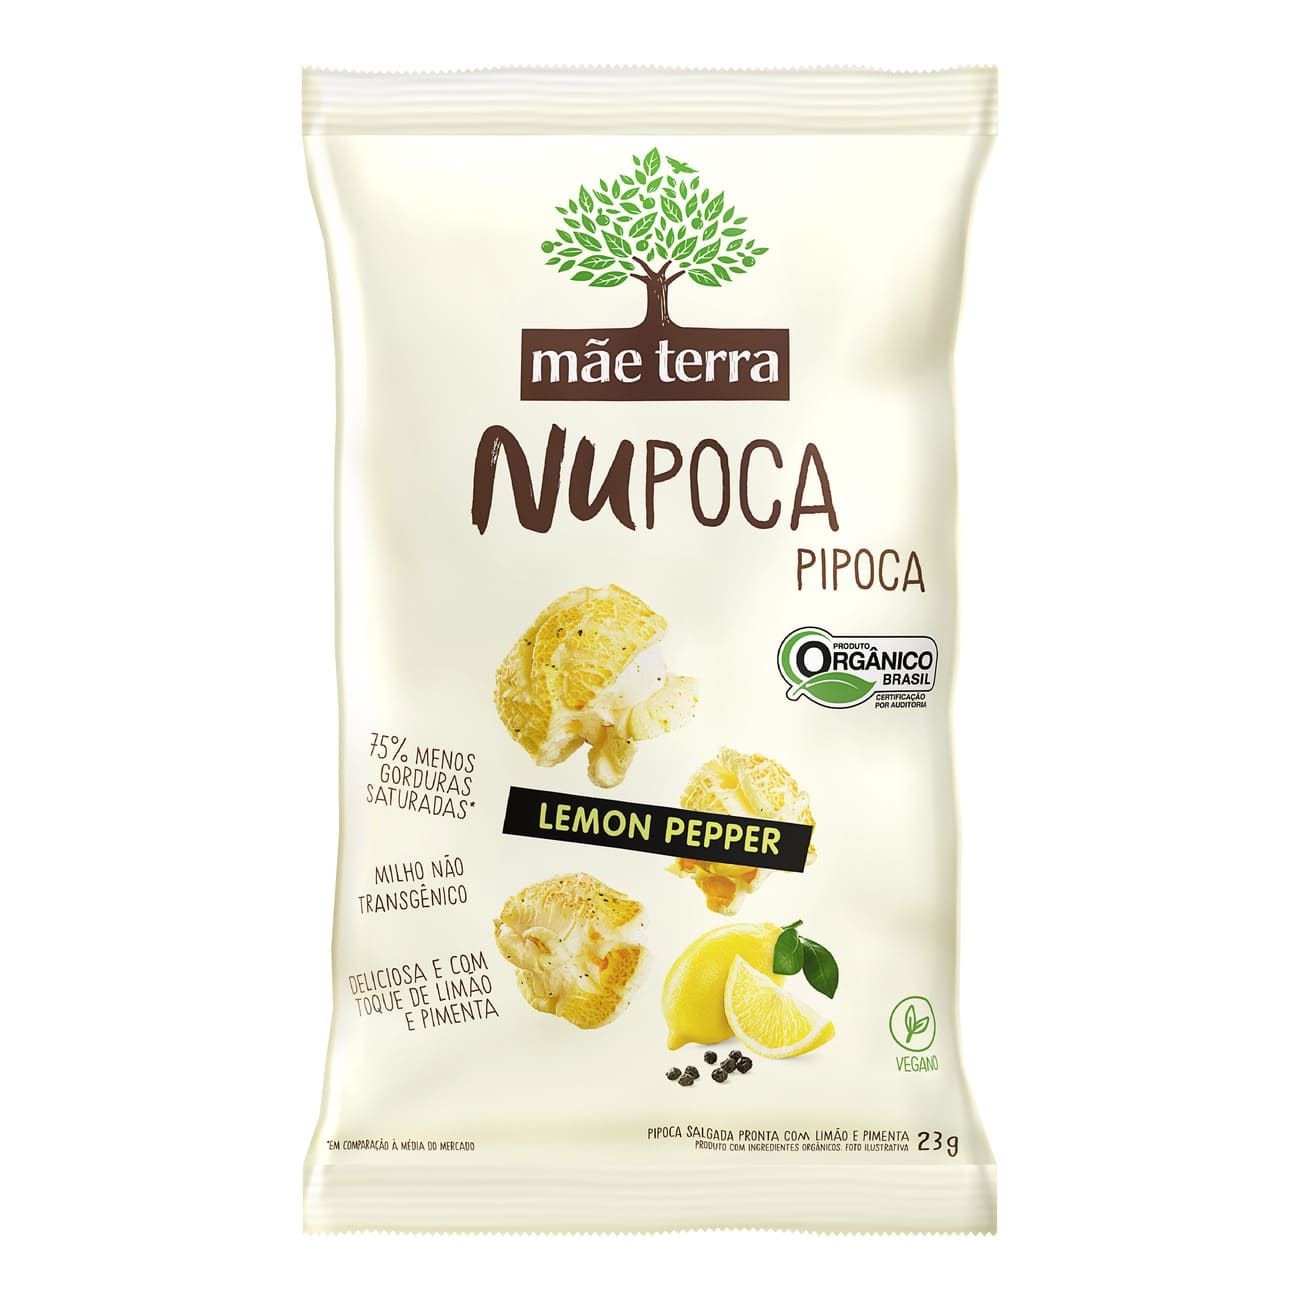 Pipoca Orgânica Mãe Terra Lemon Pepper NuPoca 23g